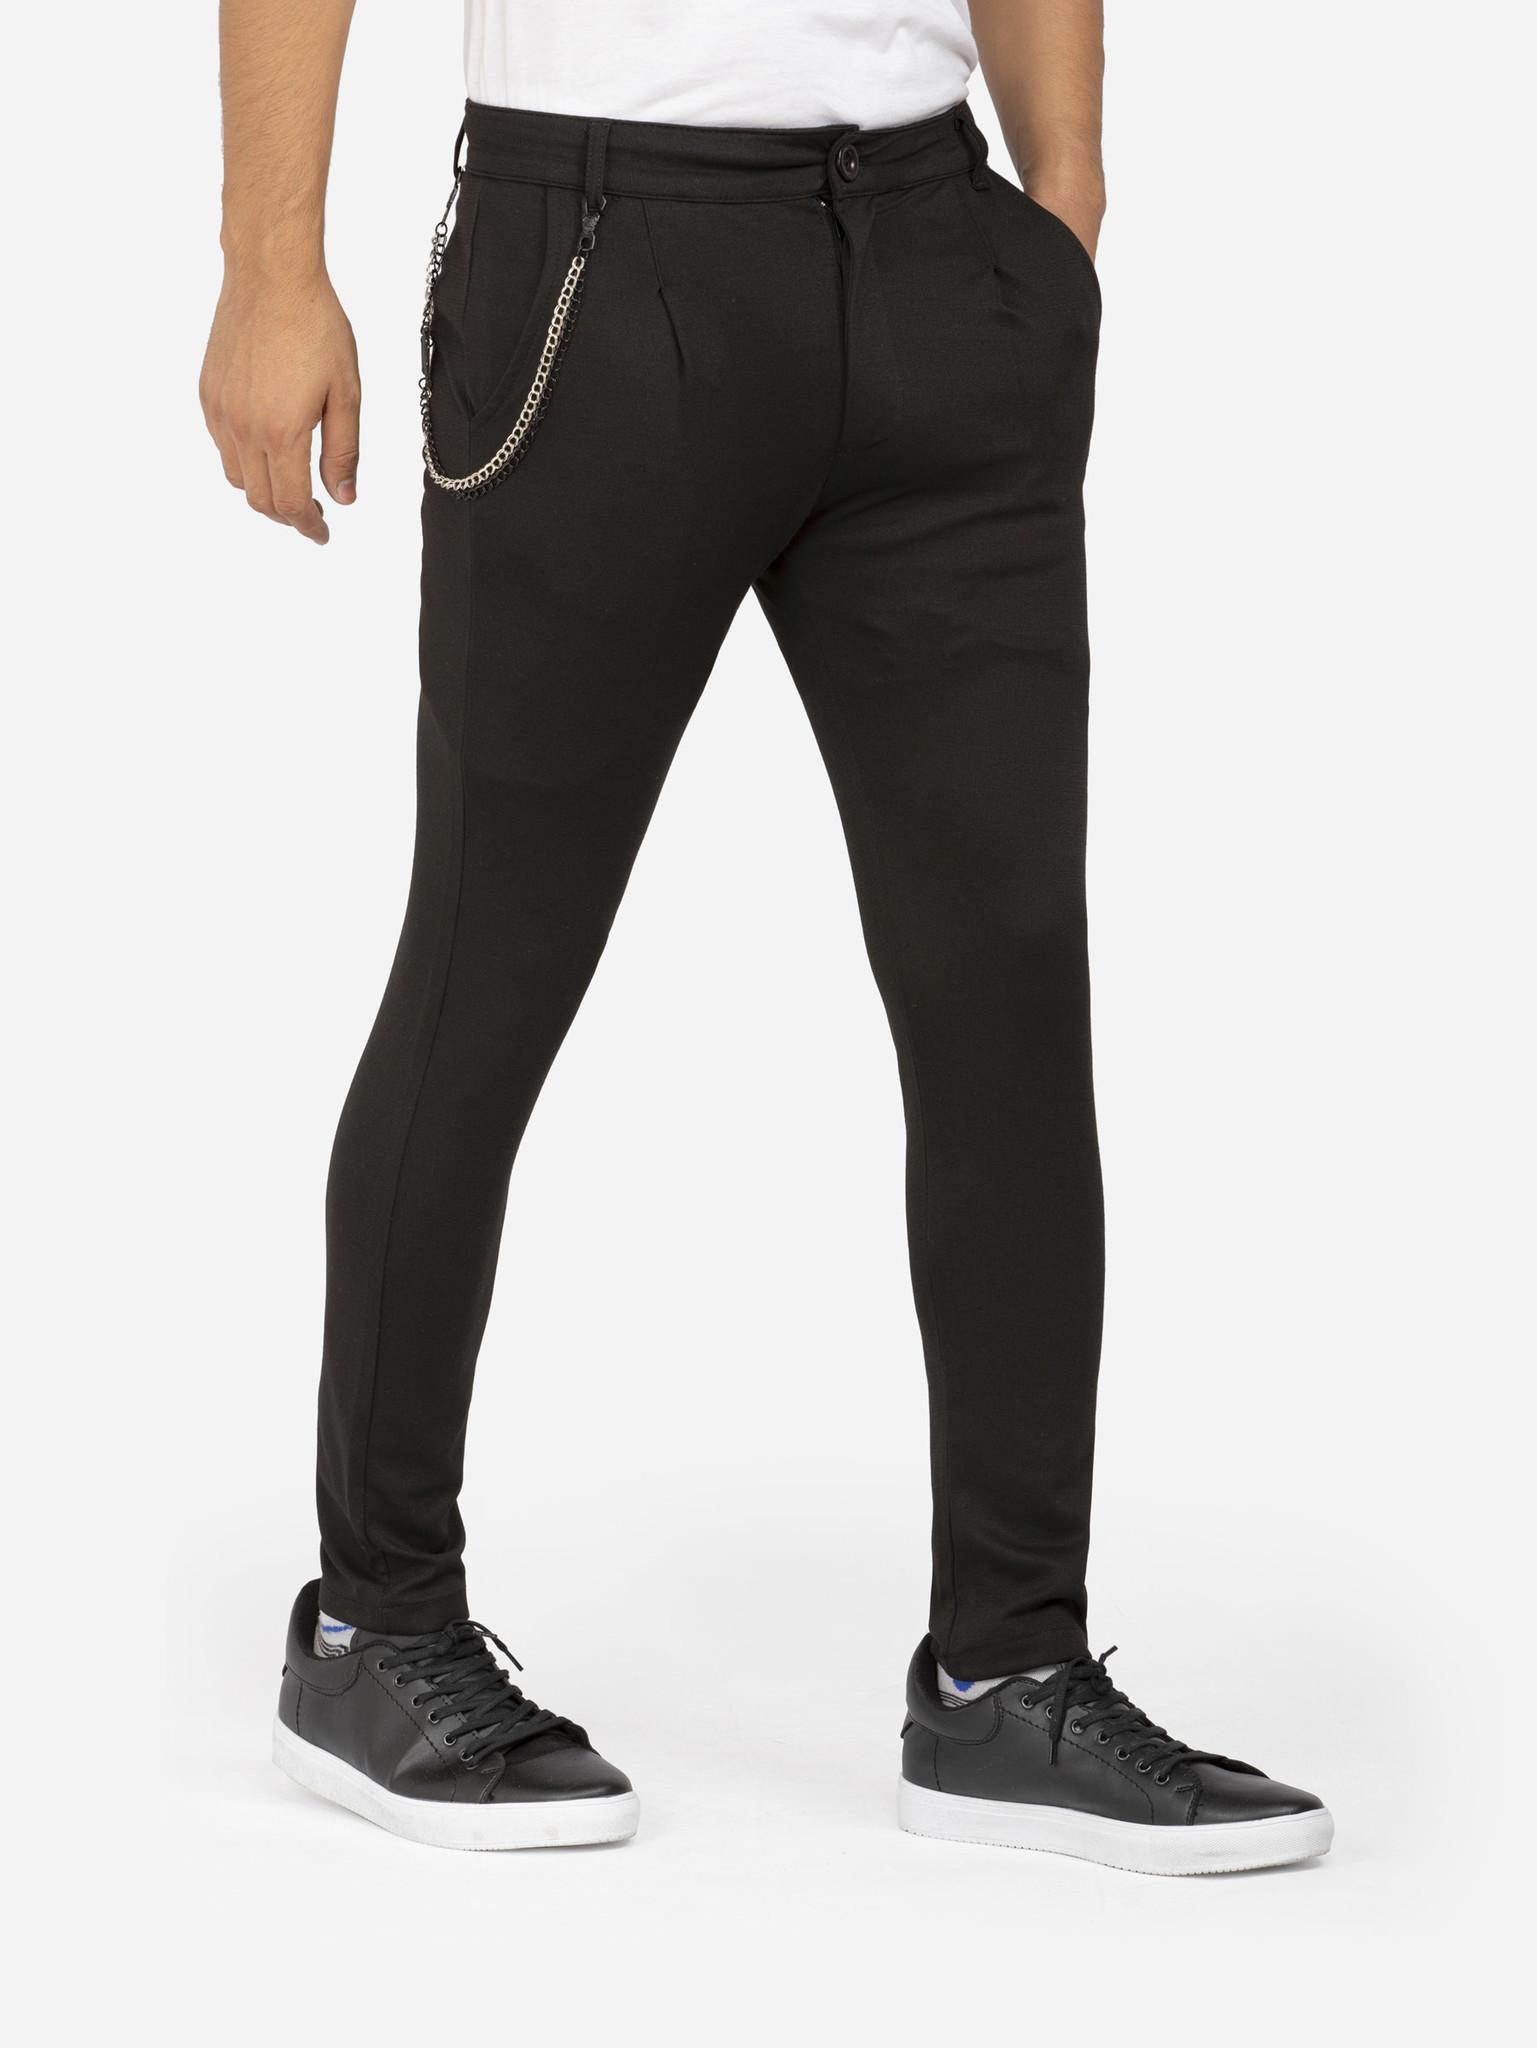 Arya Boy Pantalon 82109 Germano Black